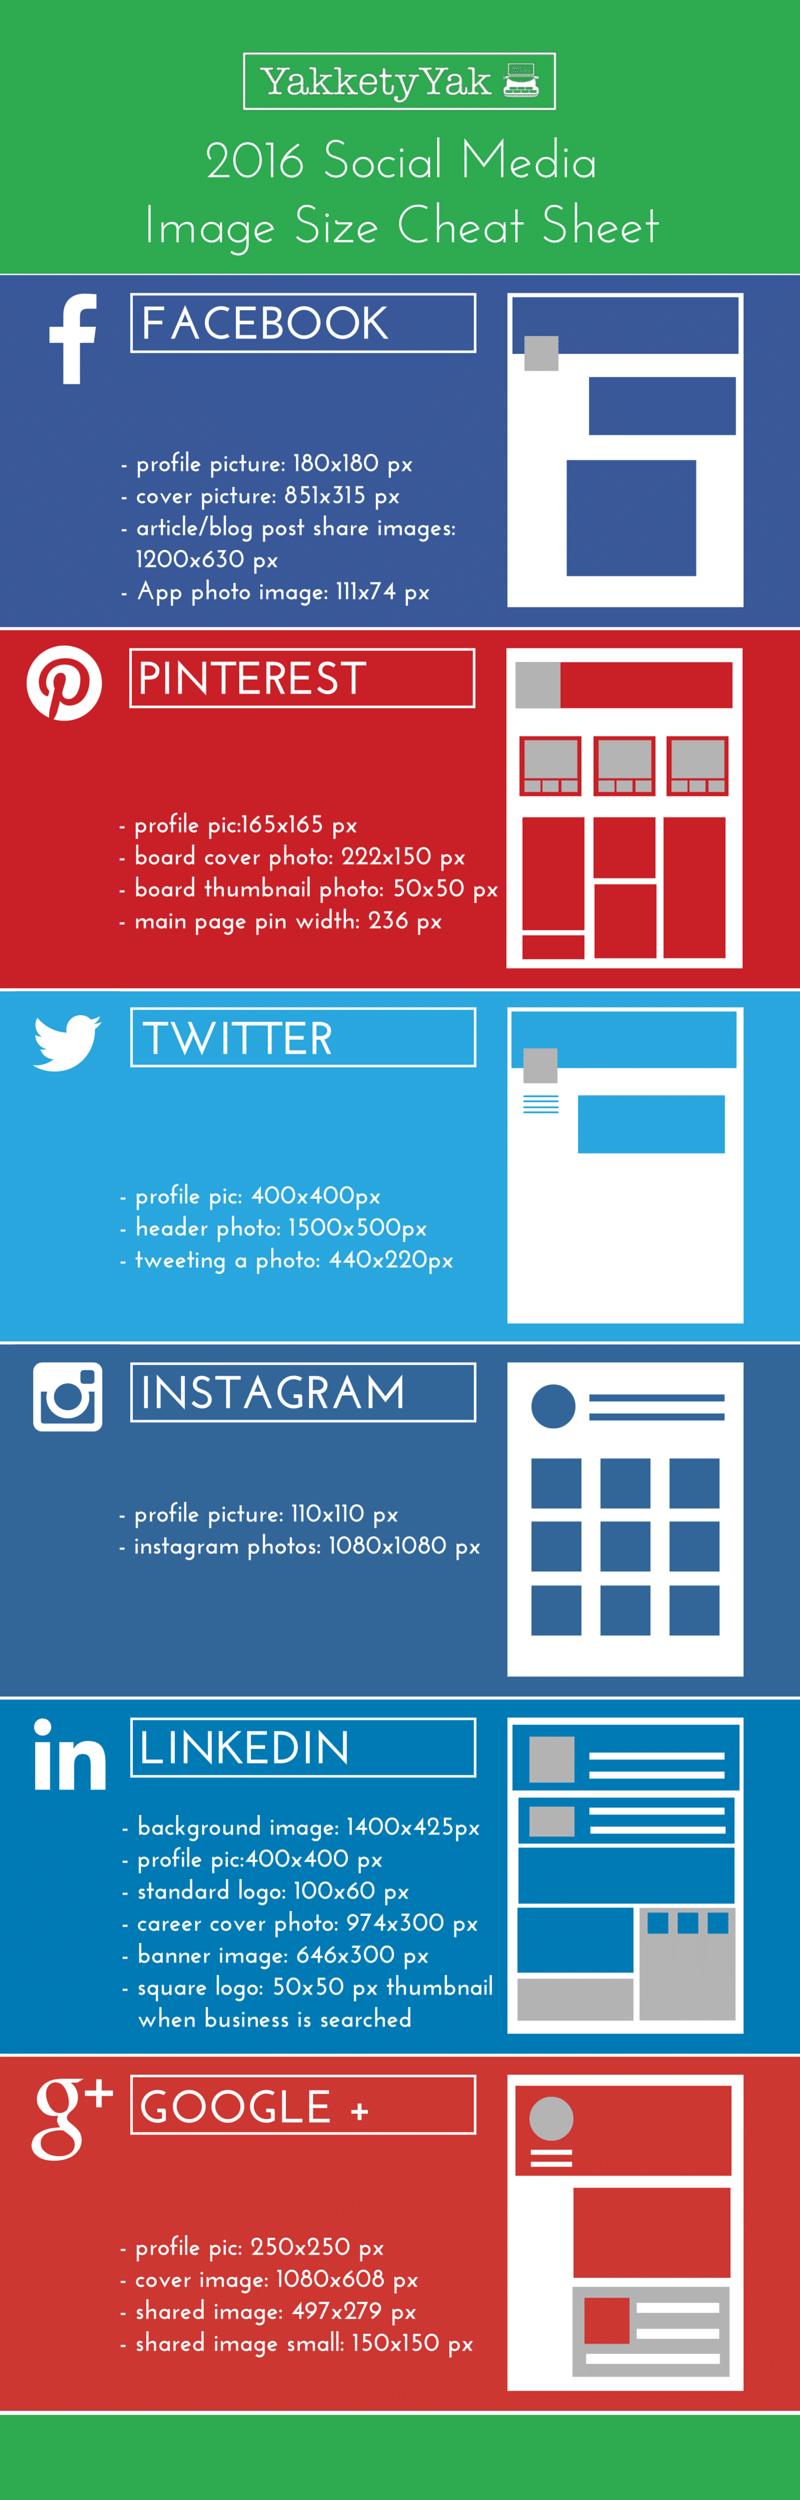 2016 Social Media Image Size Cheat Sheet FACEBOOK